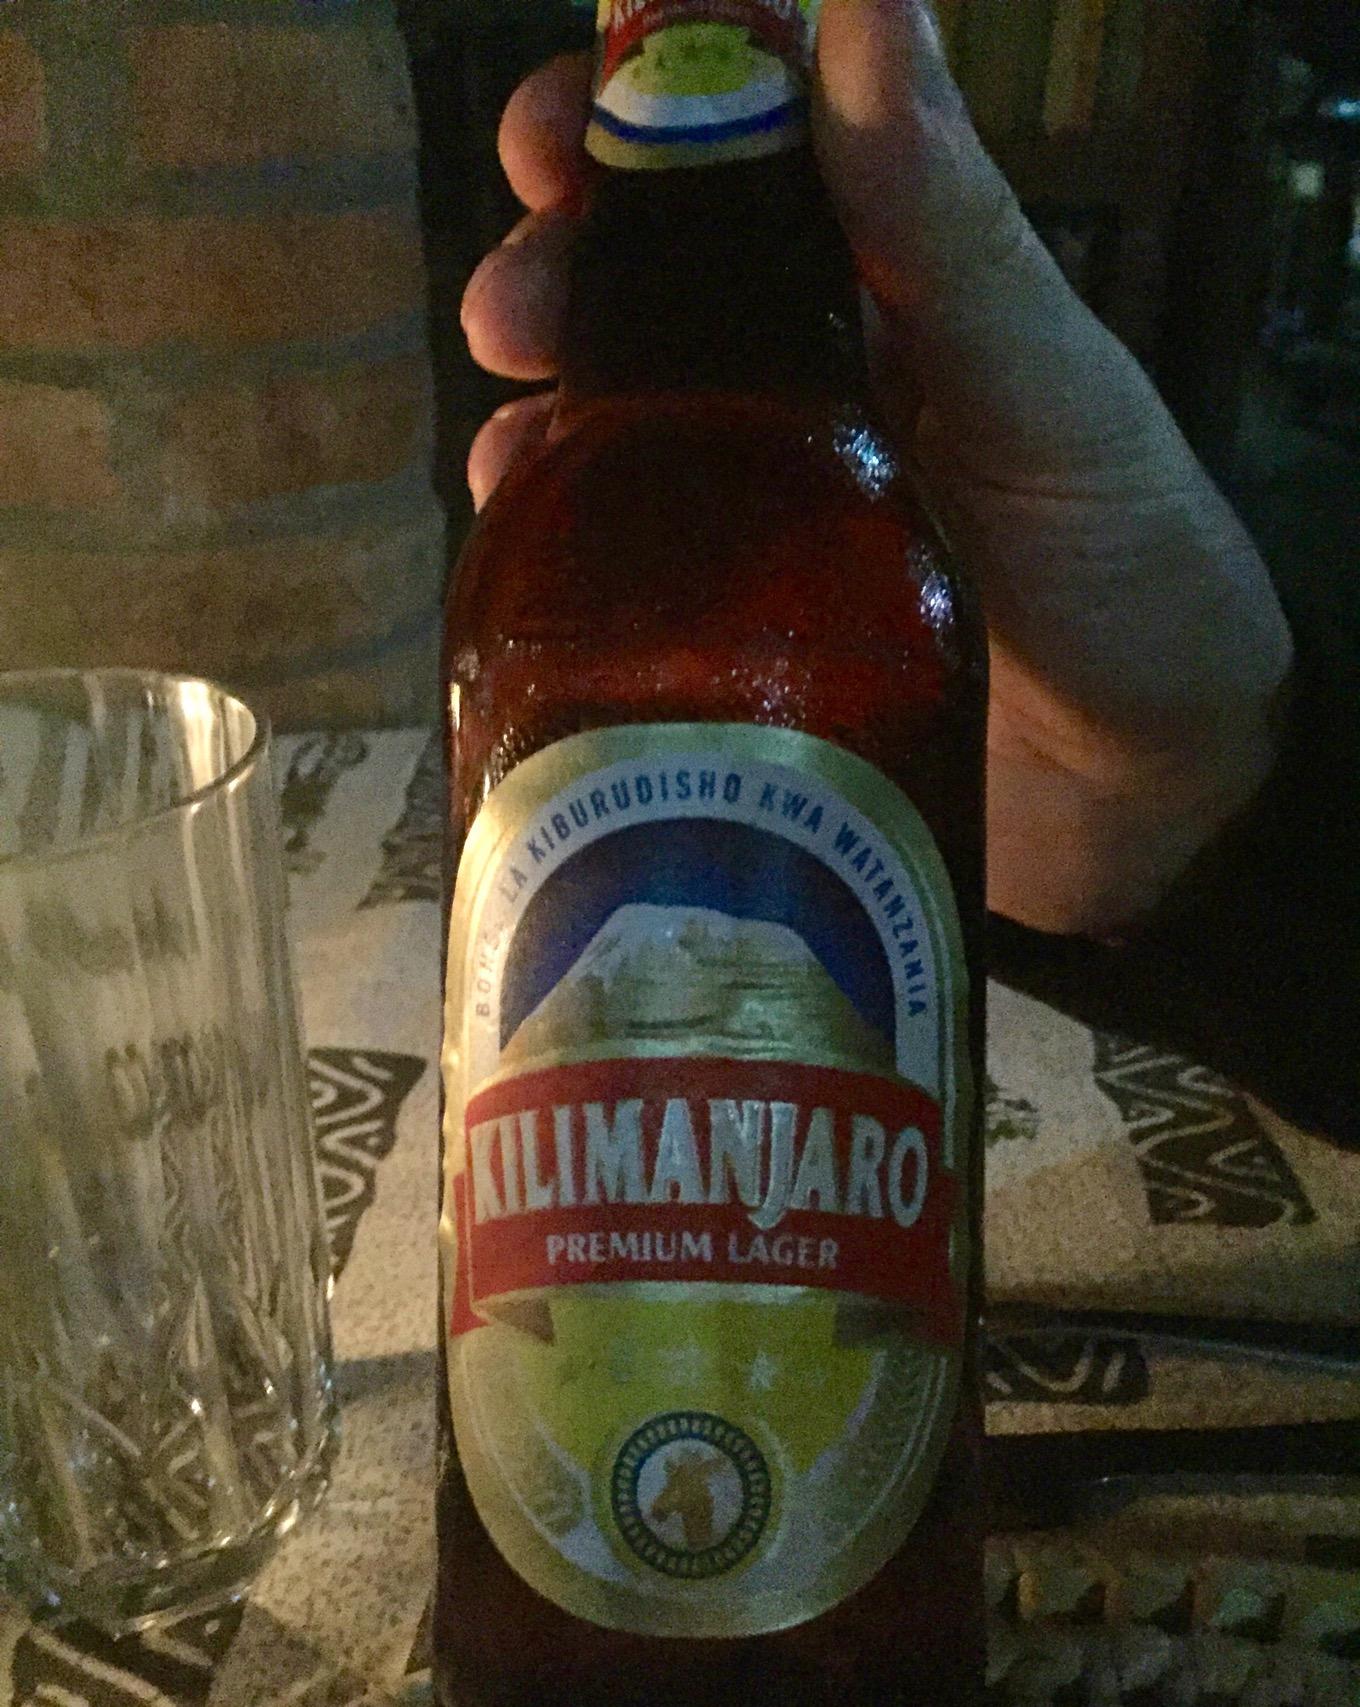 Kilimanjaro beer for dinner at Ambureni Coffee Lodge